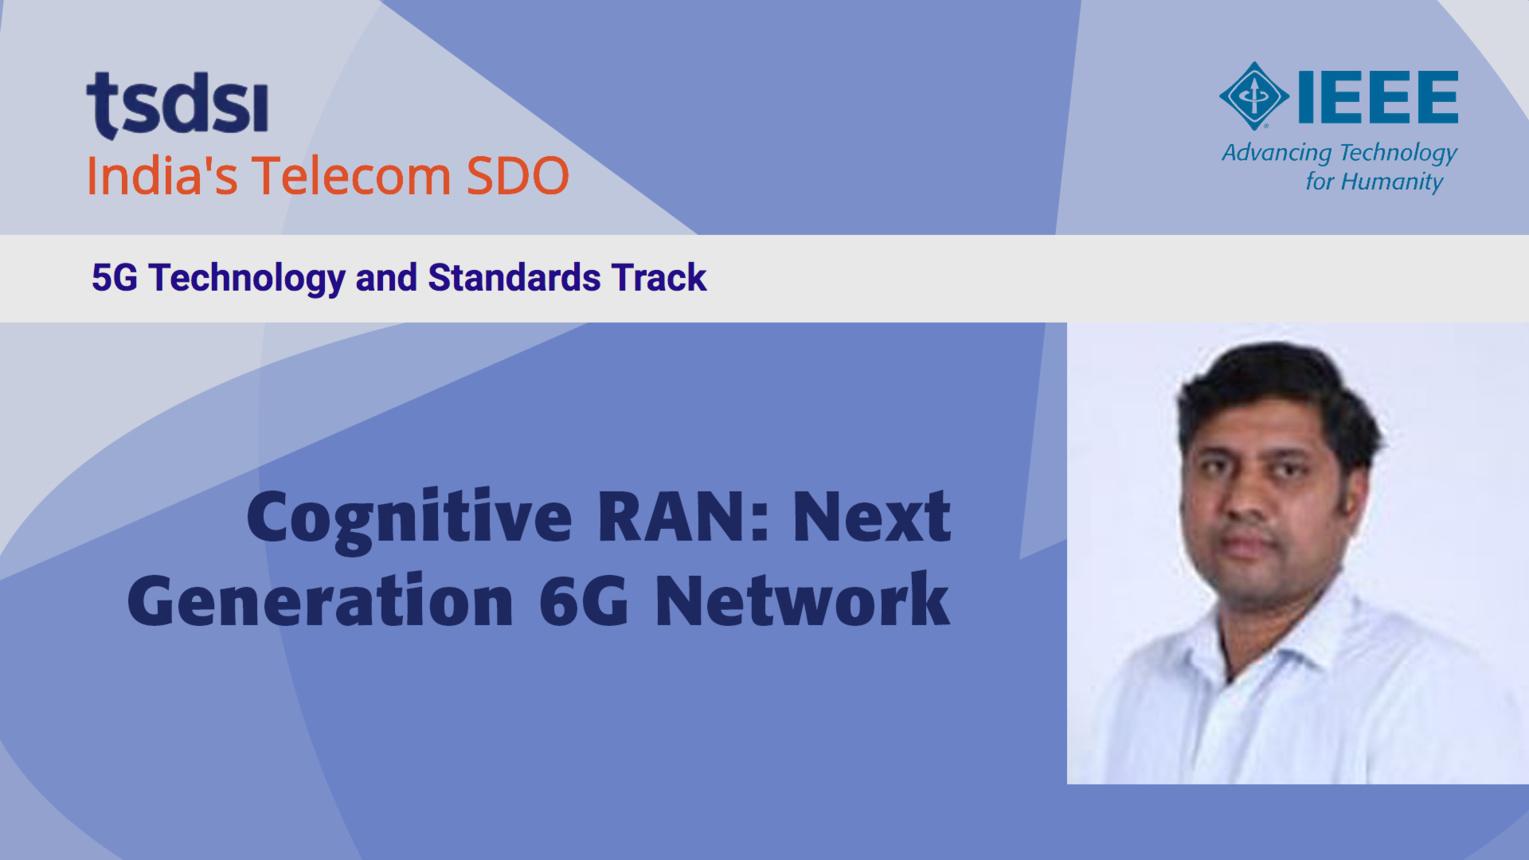 Cognitive RAN: Next Generation 6G Network - Parag Naik - India Mobile Congress, 2018